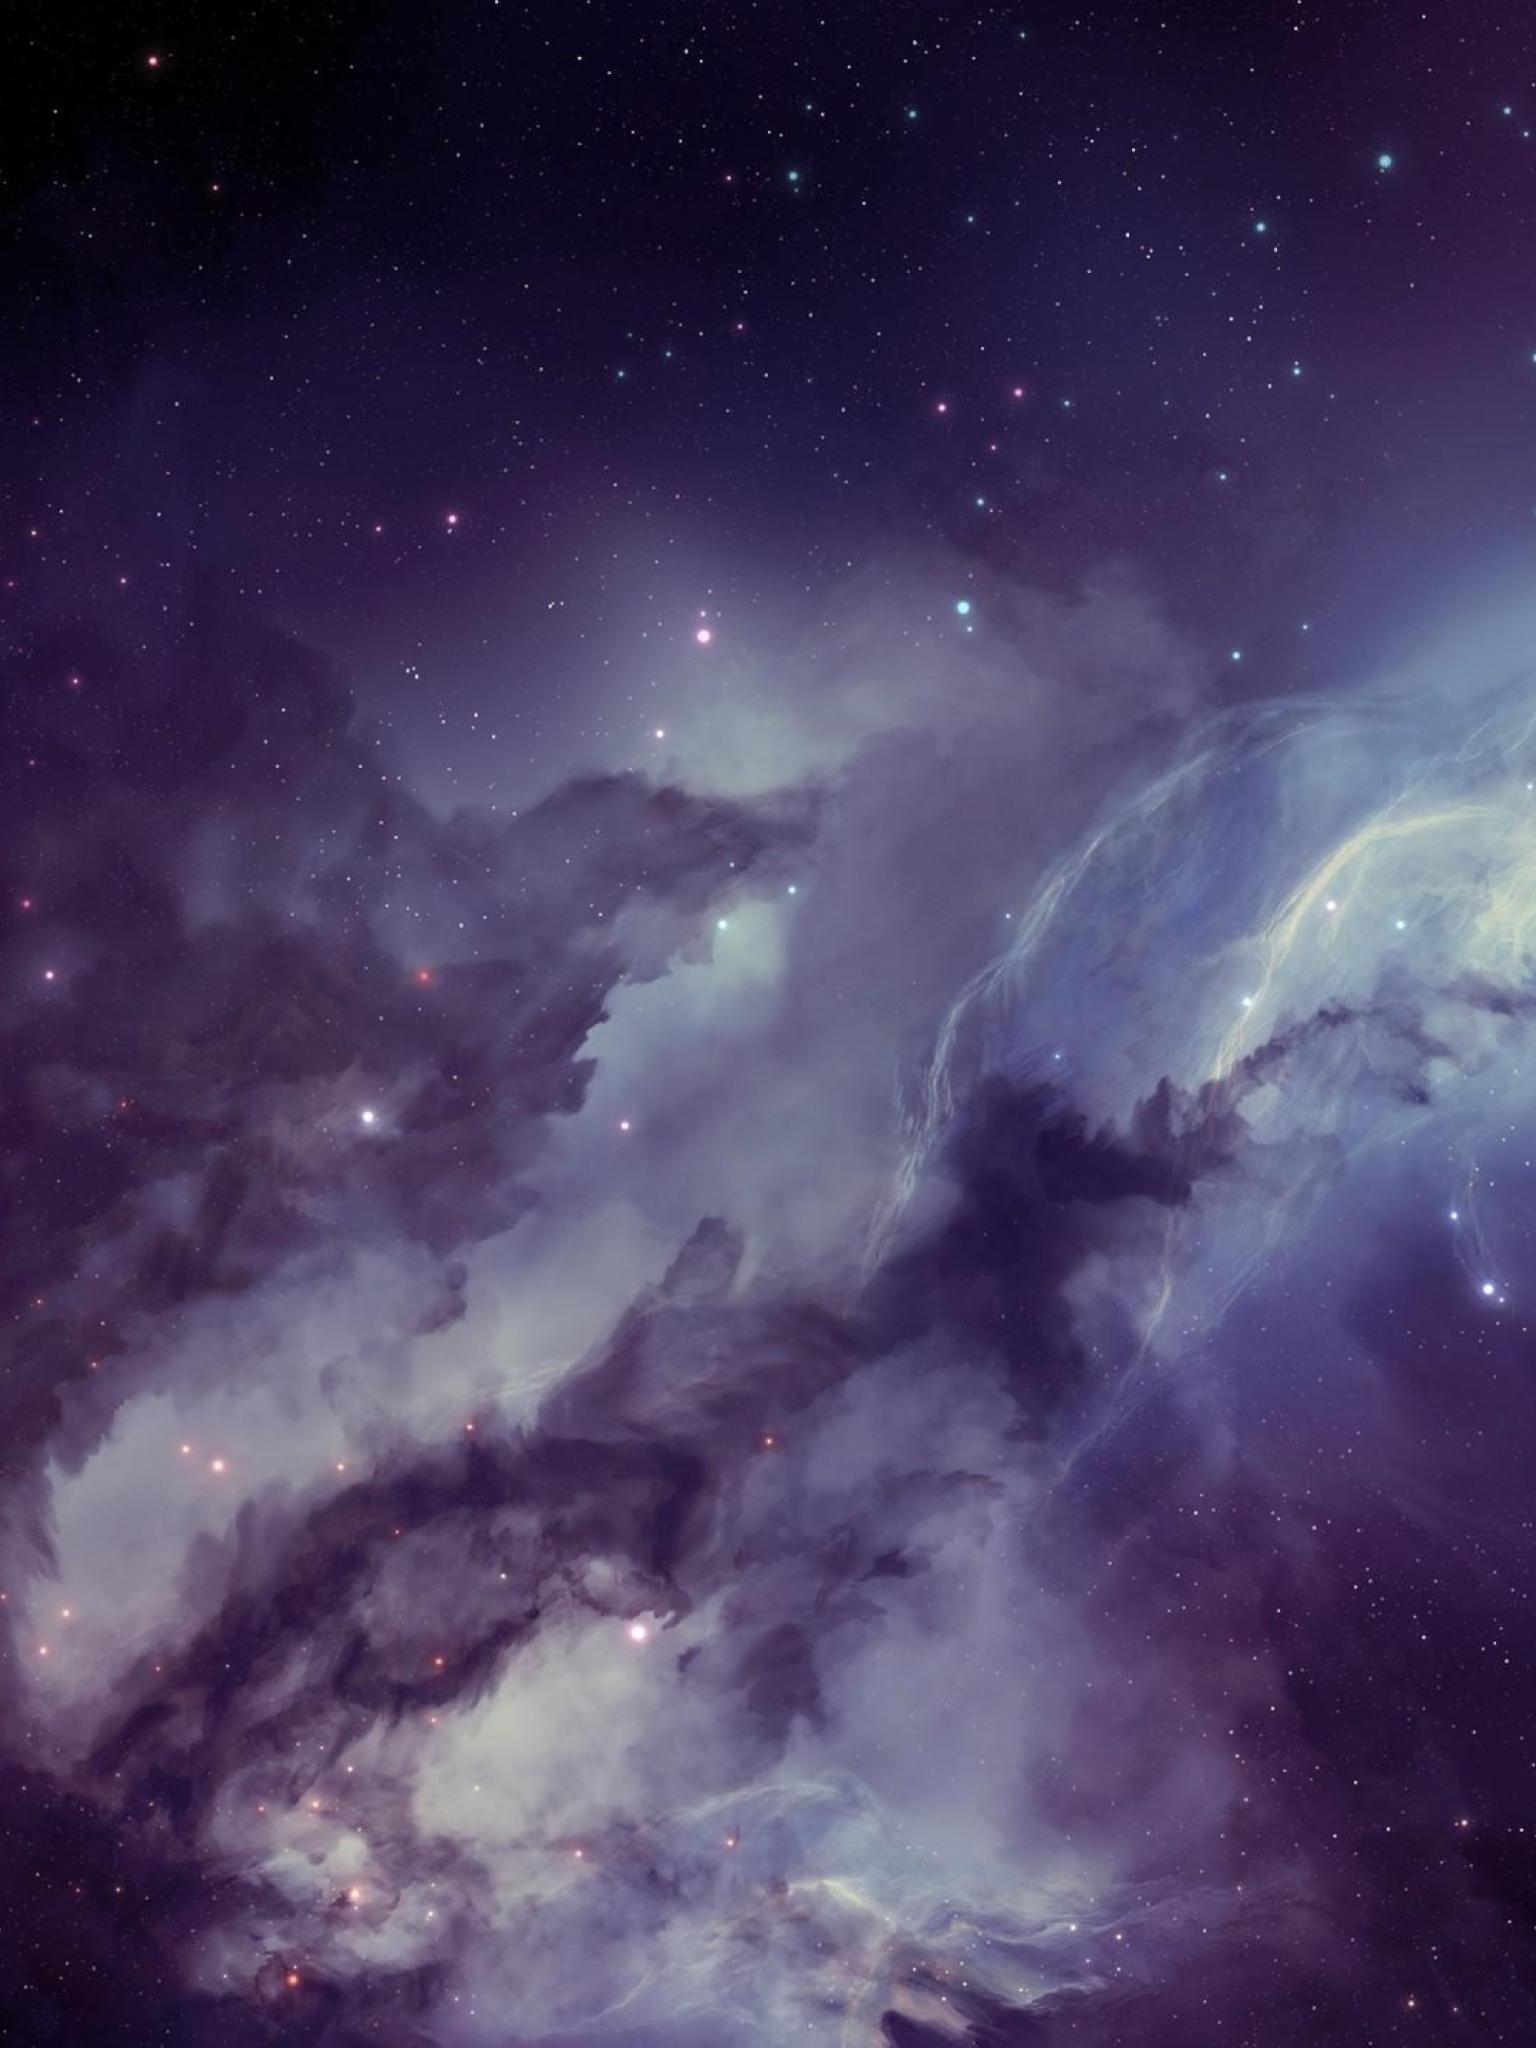 3840x2160px Nebula 4K Wallpaper